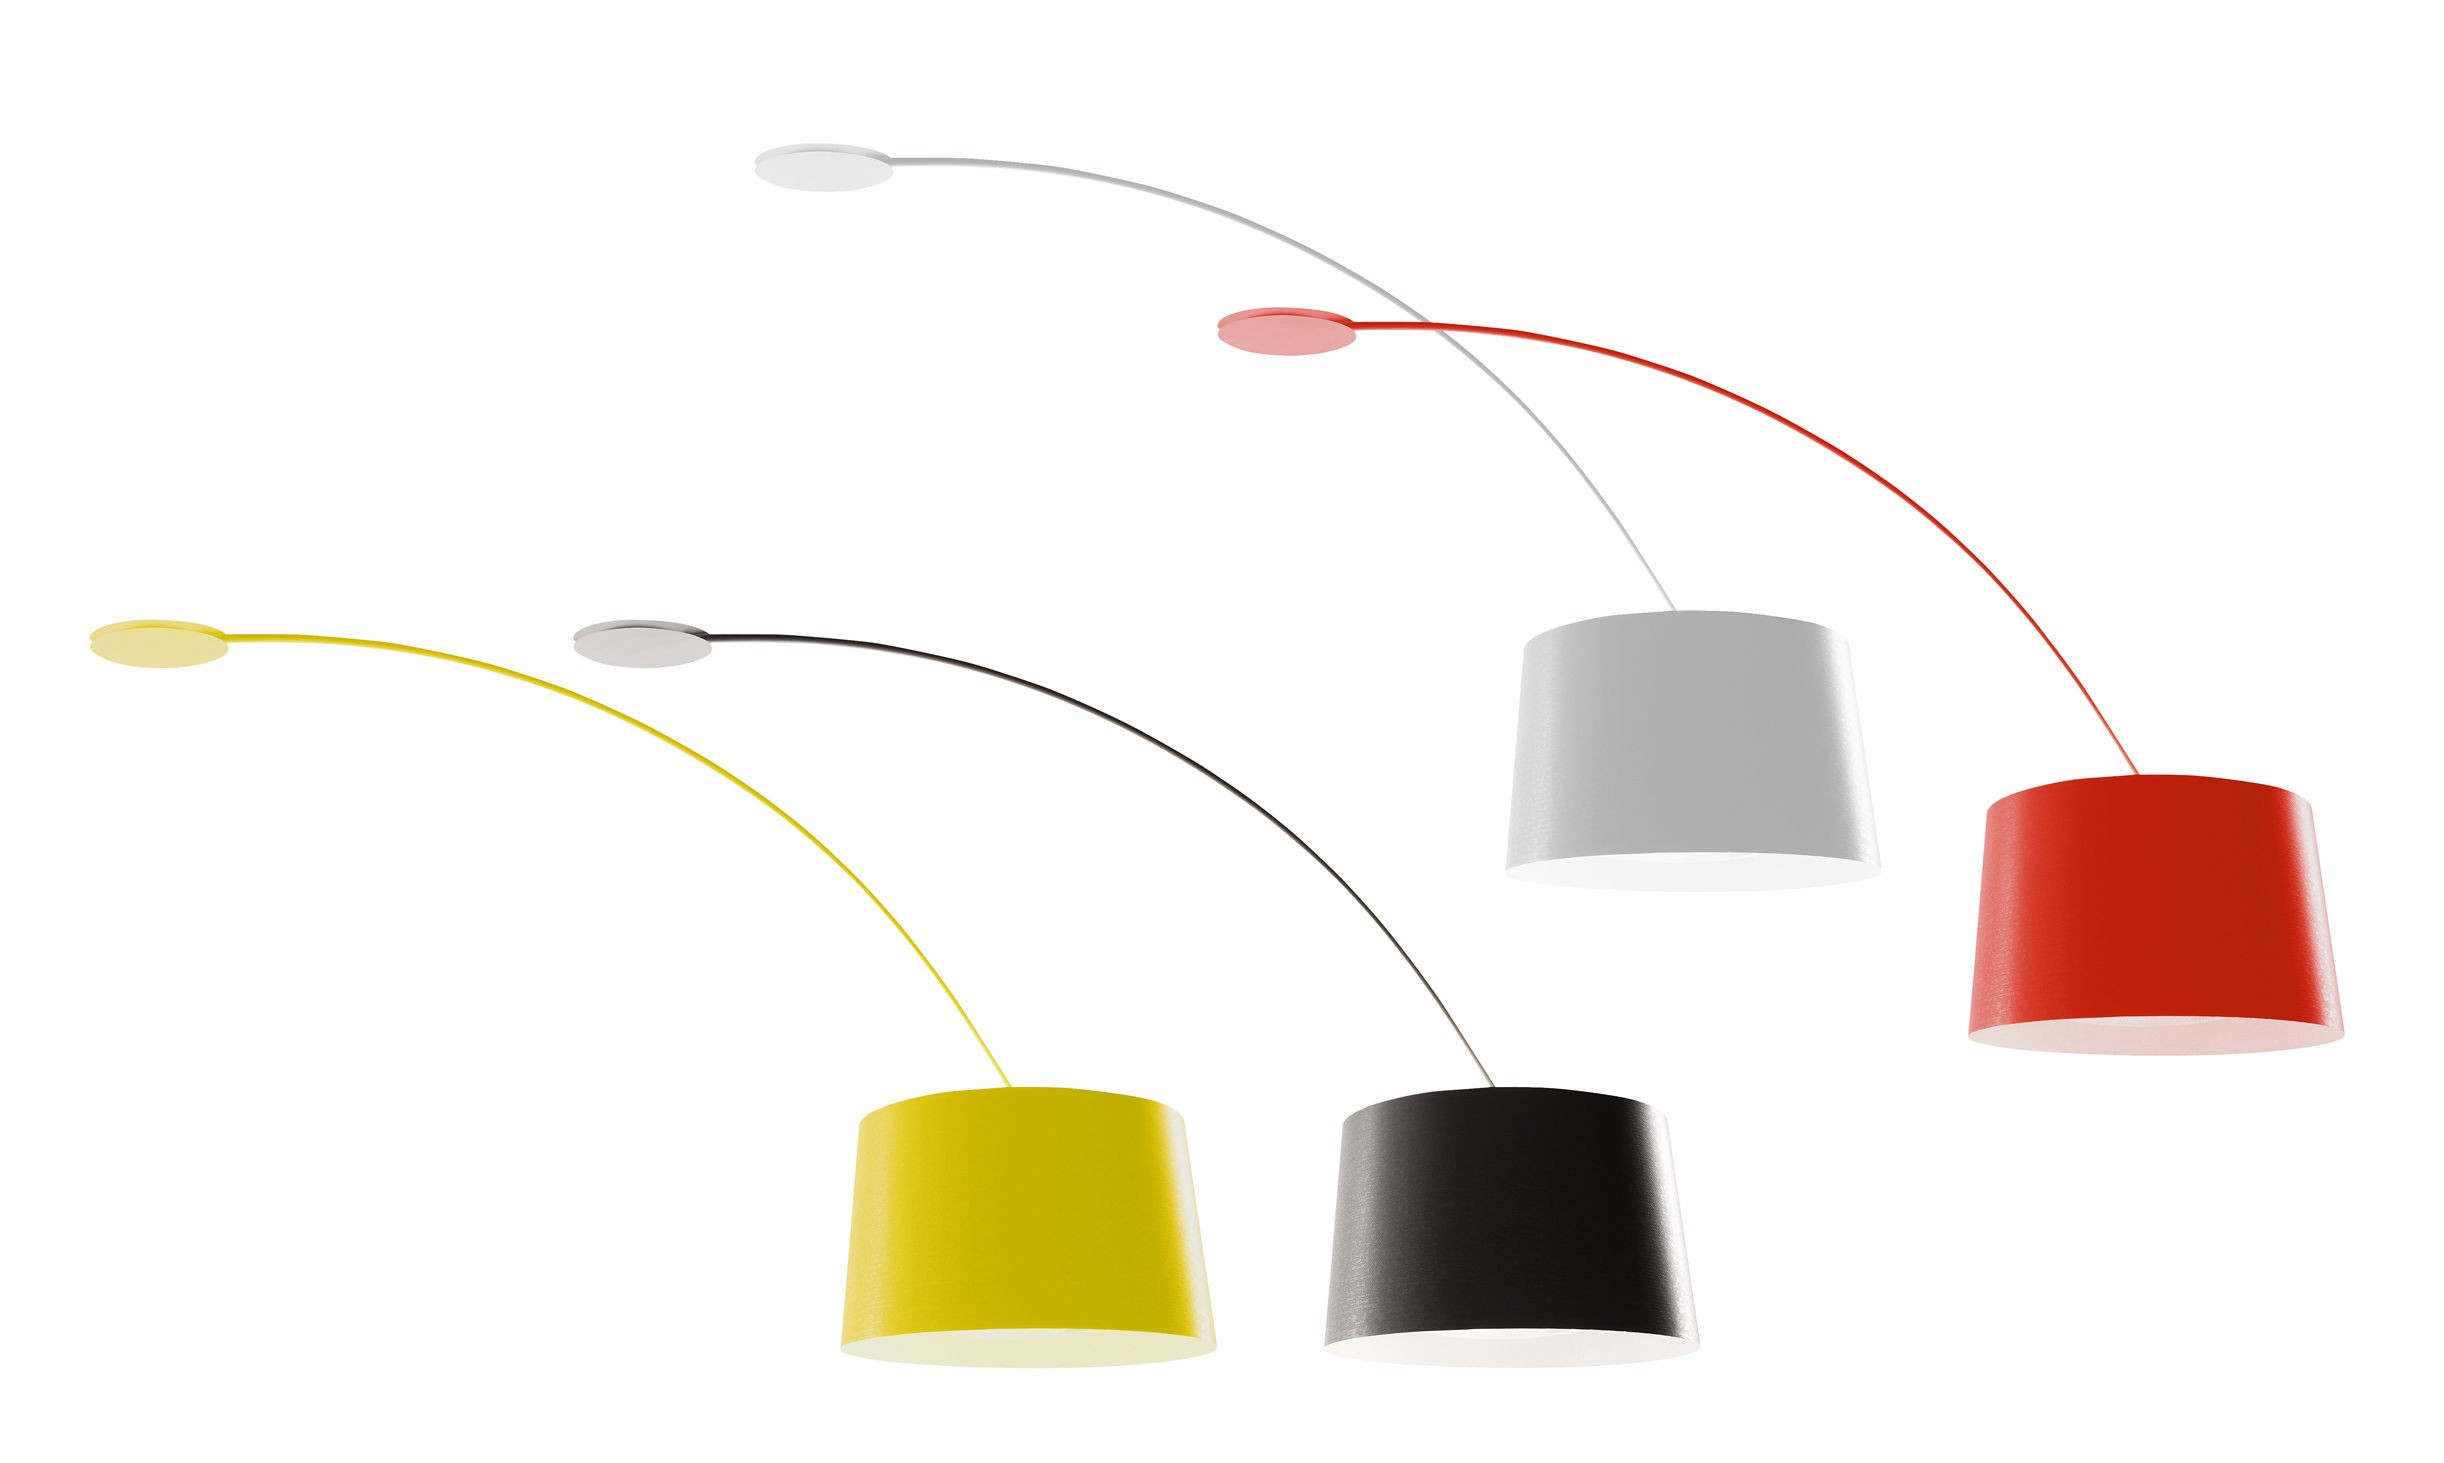 Foscarini Twiggy Ceiling Lamp | Deplain.com